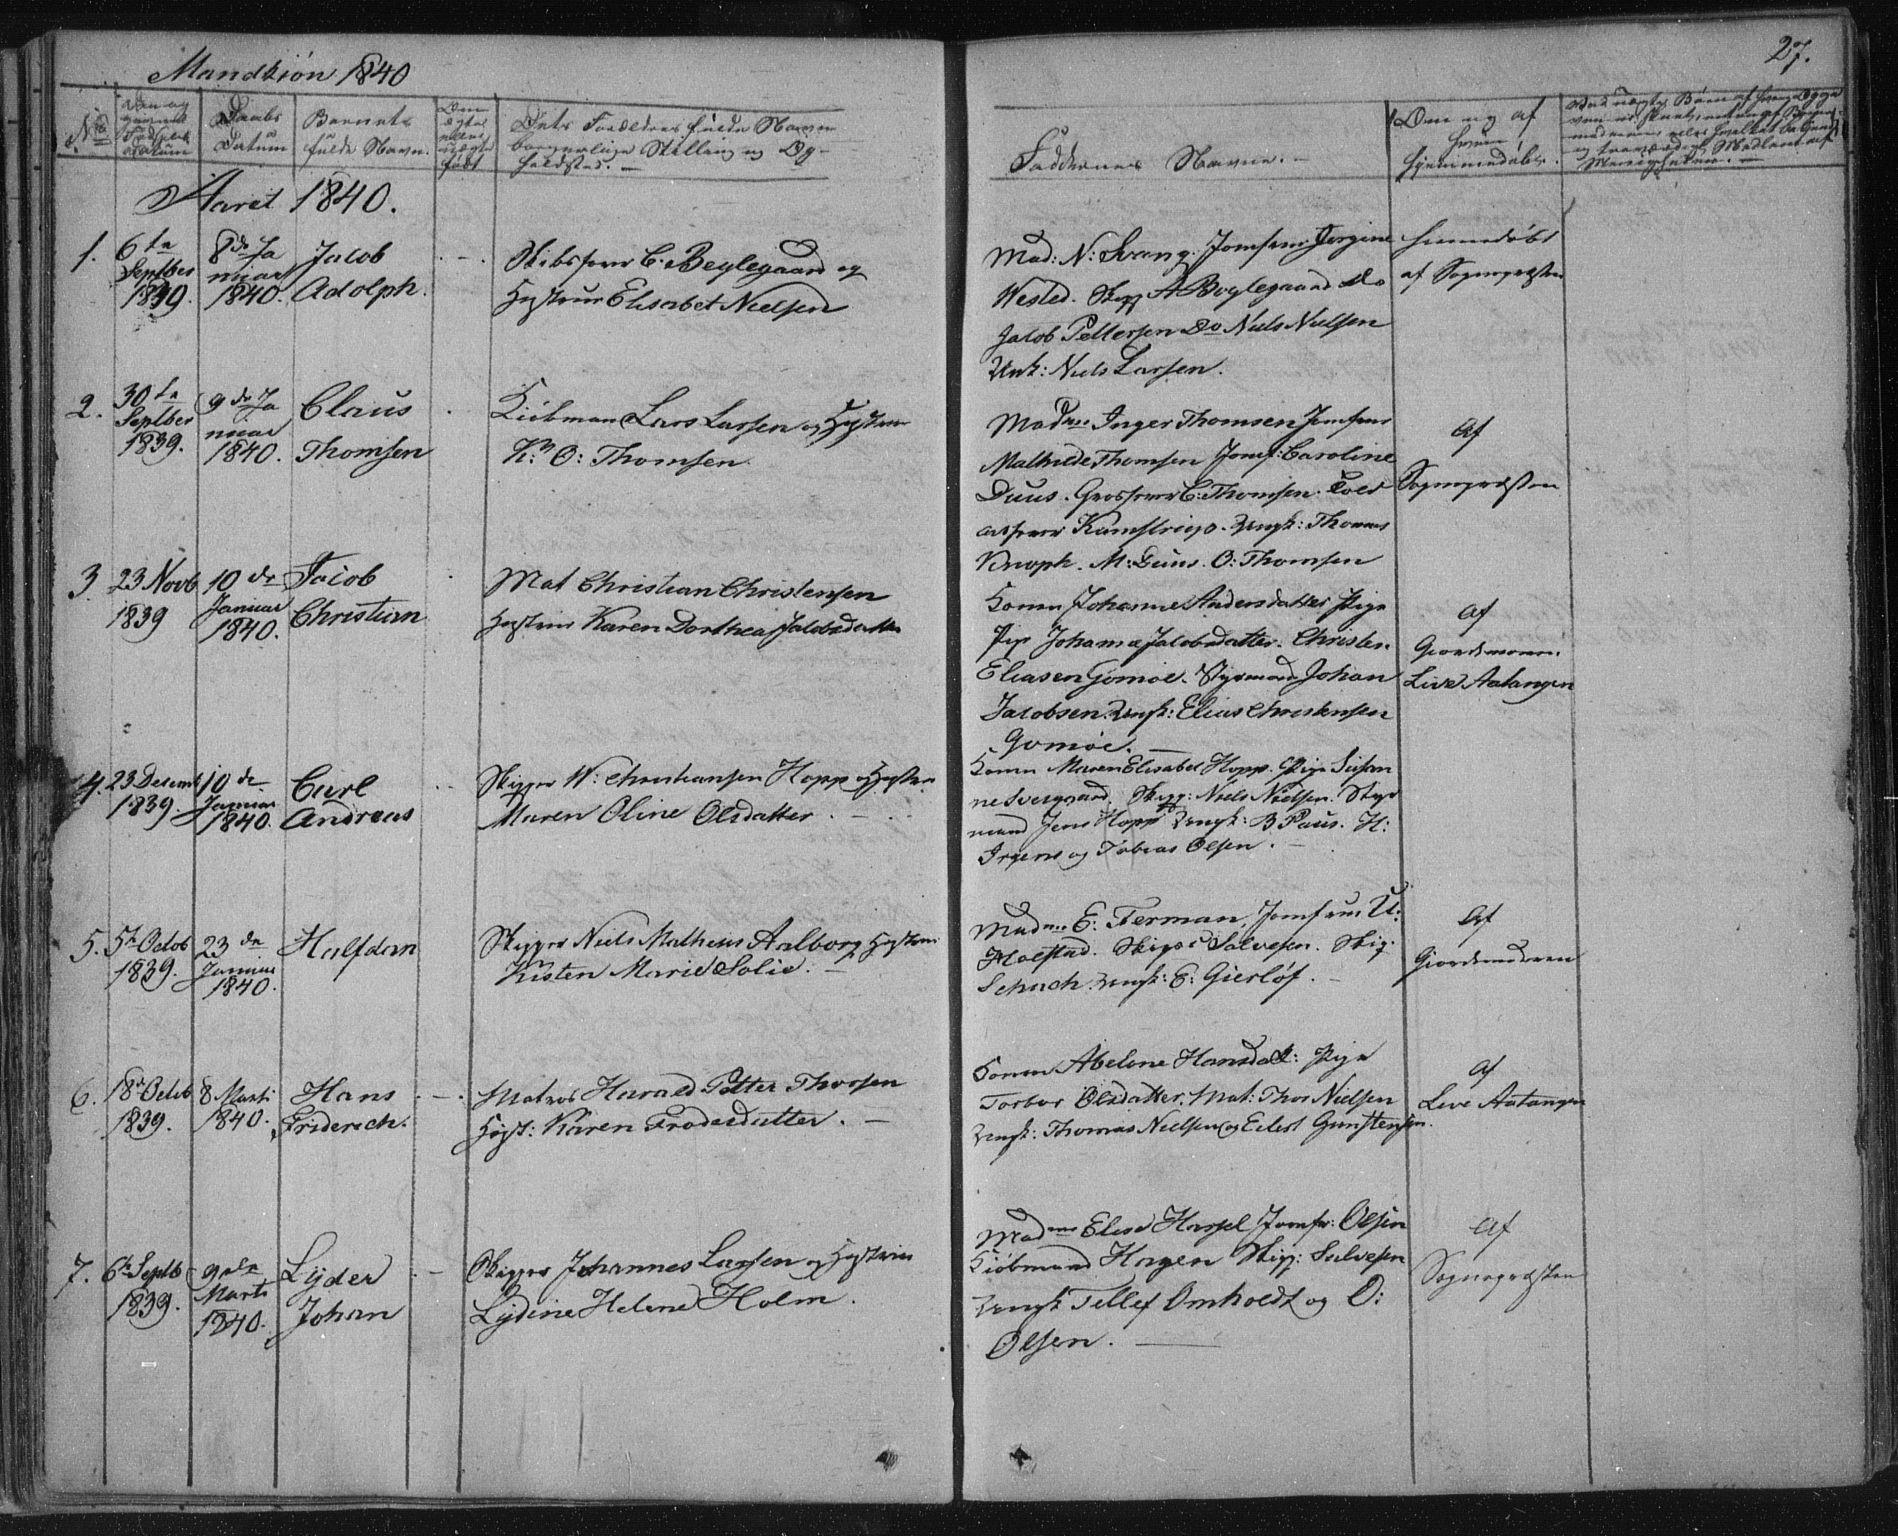 SAKO, Kragerø kirkebøker, F/Fa/L0005: Ministerialbok nr. 5, 1832-1847, s. 27